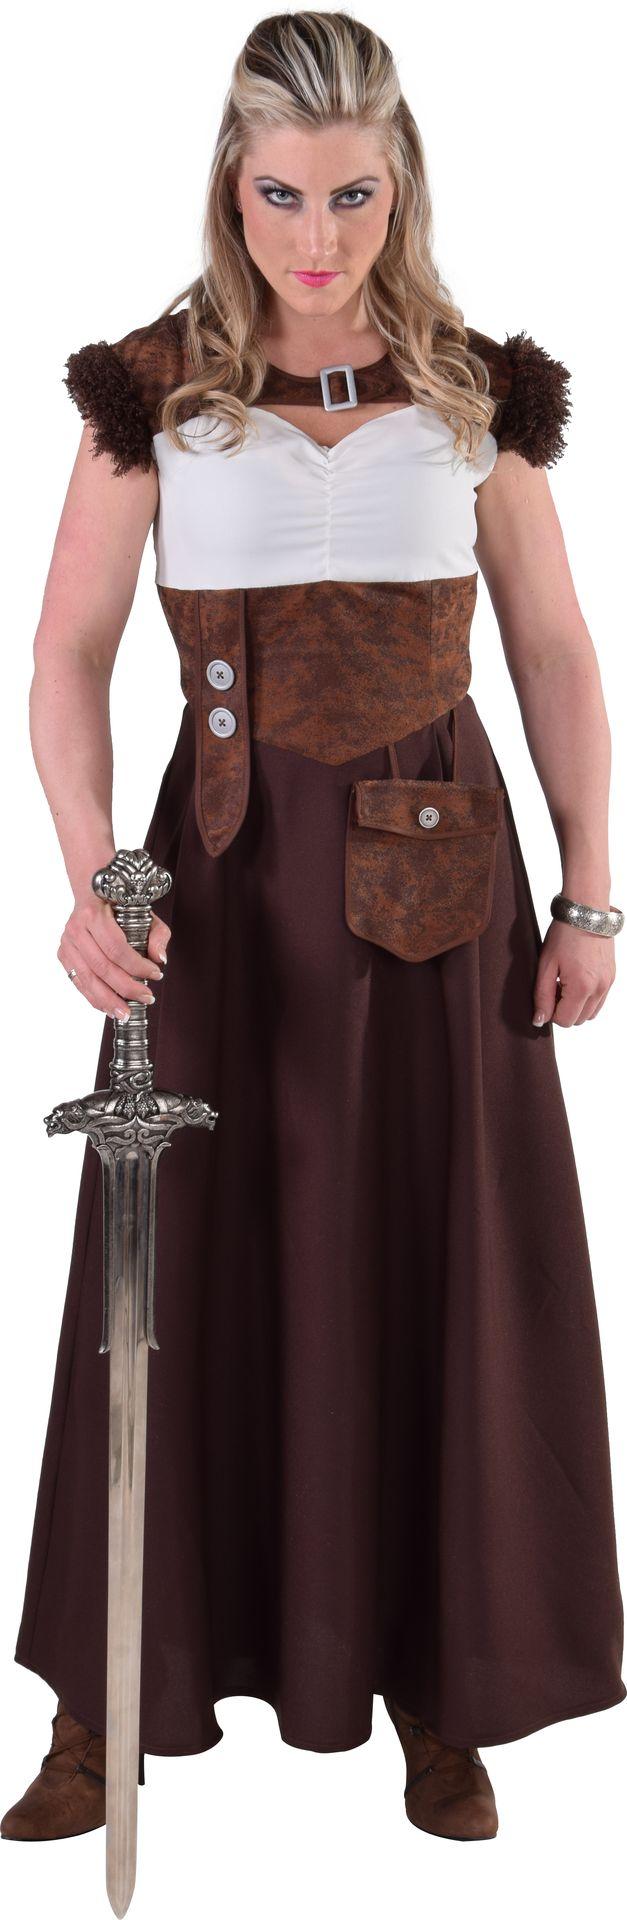 Bruine vikingen jurk vrouwen